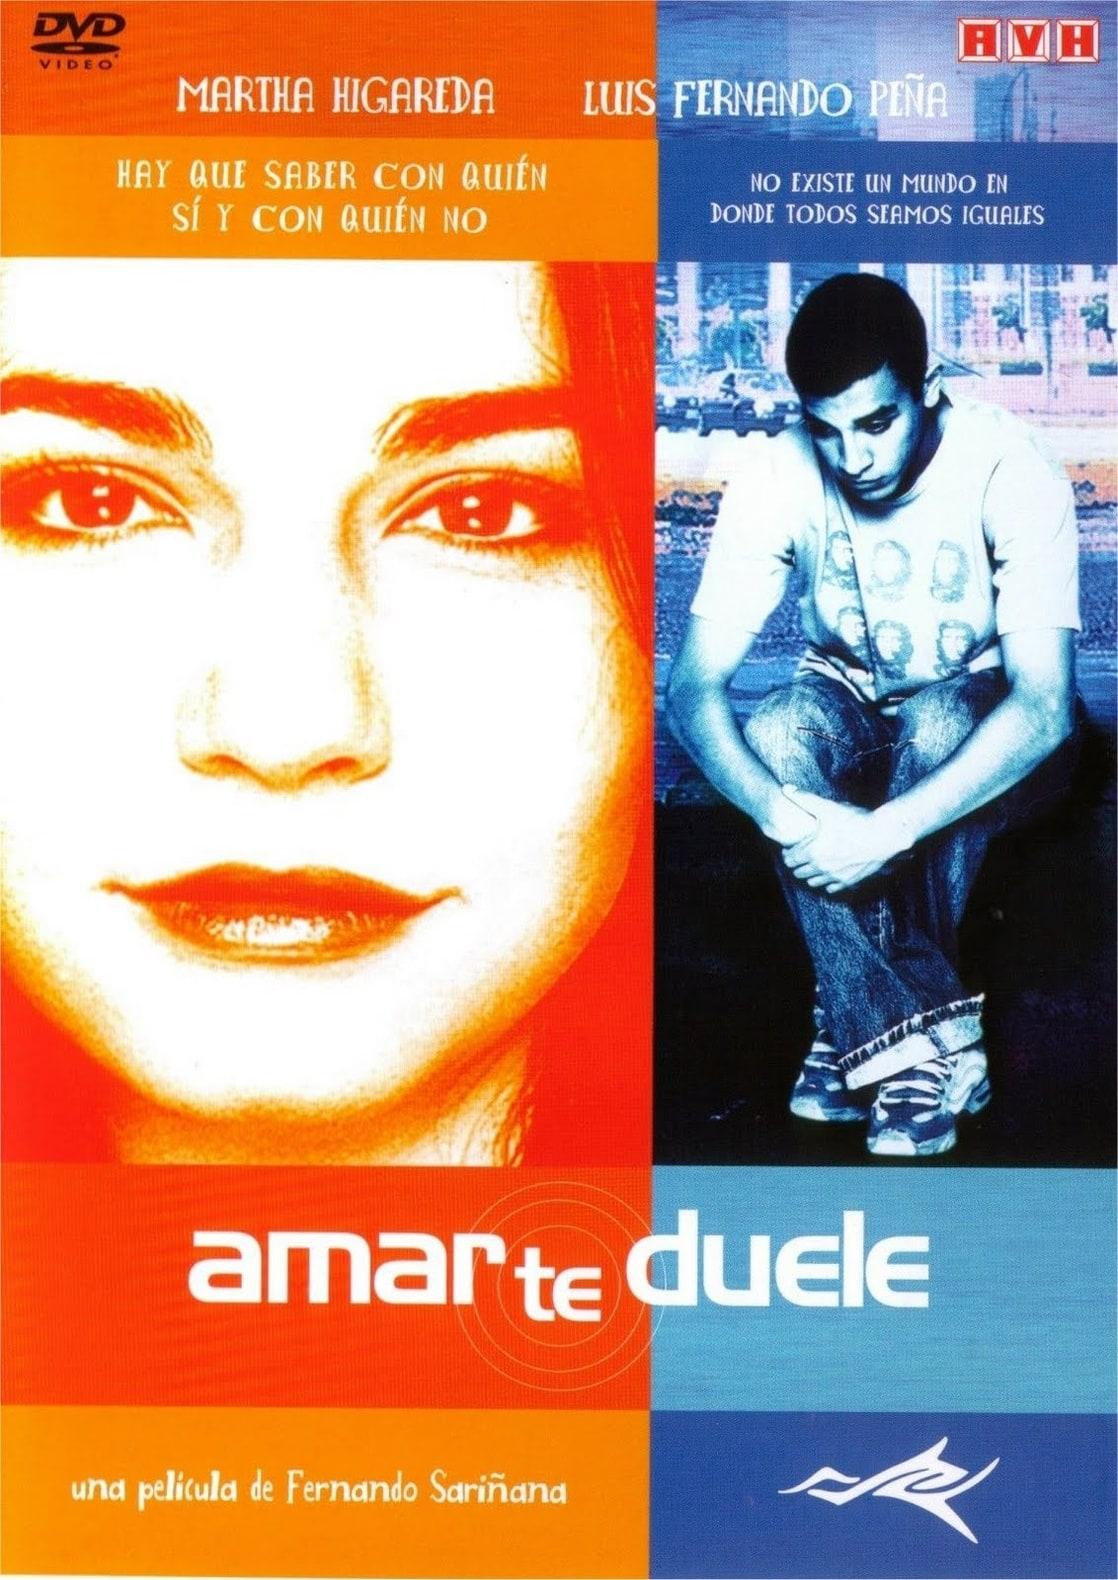 Amar Te Duele Full Movie picture of amar te duele